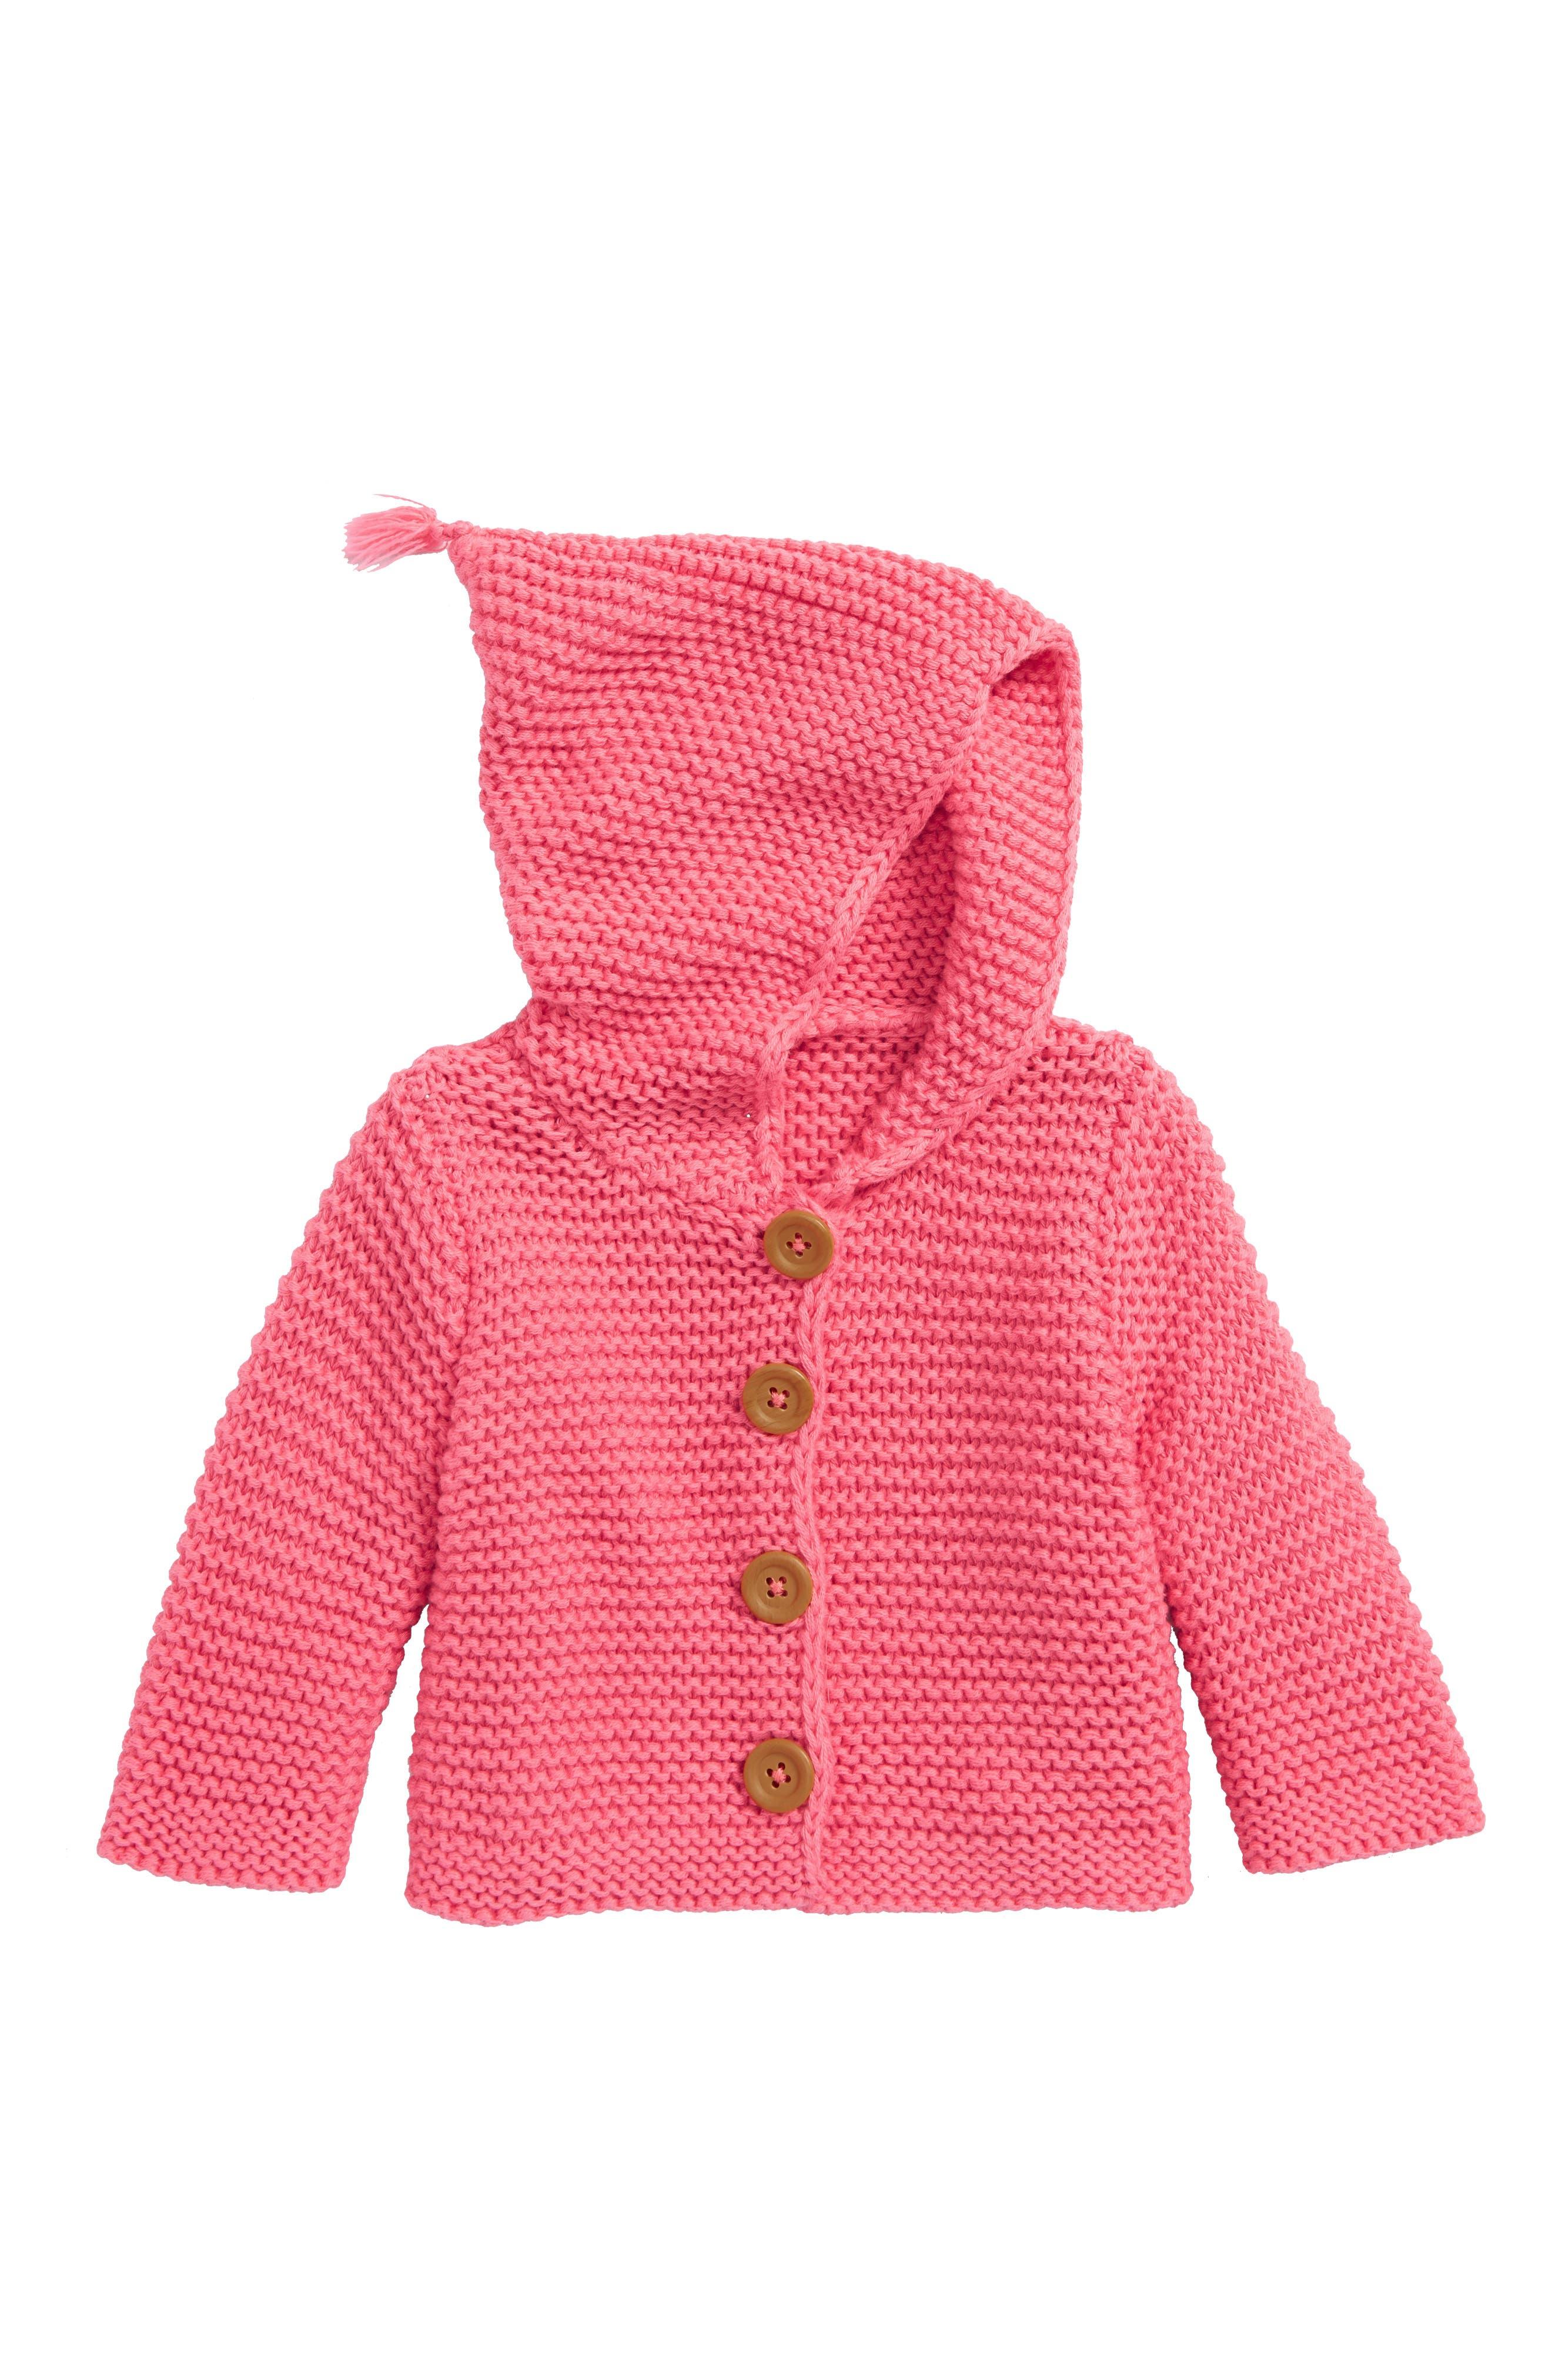 Lofty Organic Cotton Hooded Cardigan,                             Main thumbnail 1, color,                             Pink Lemonade